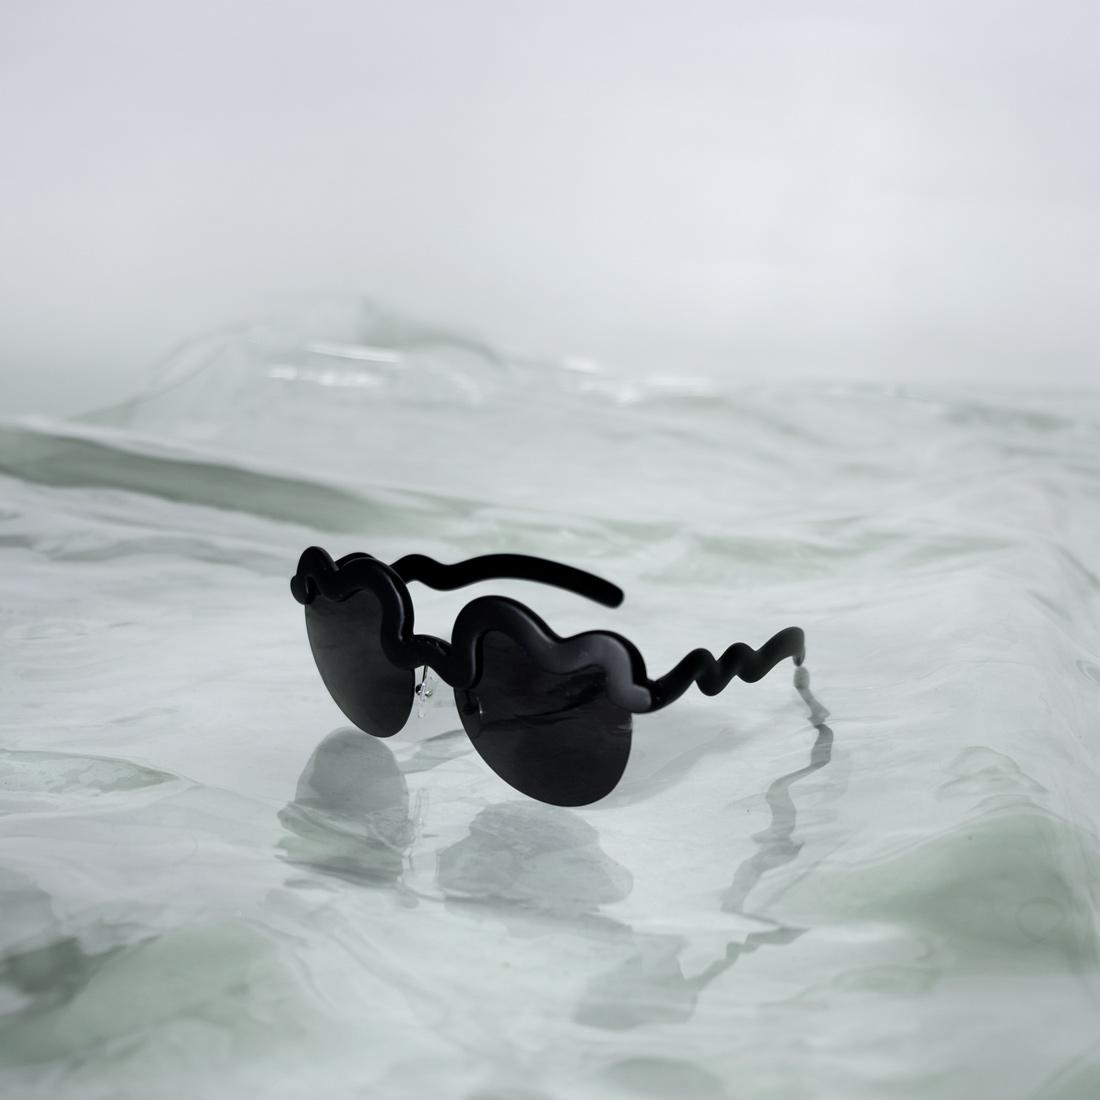 LCDglasses_black3